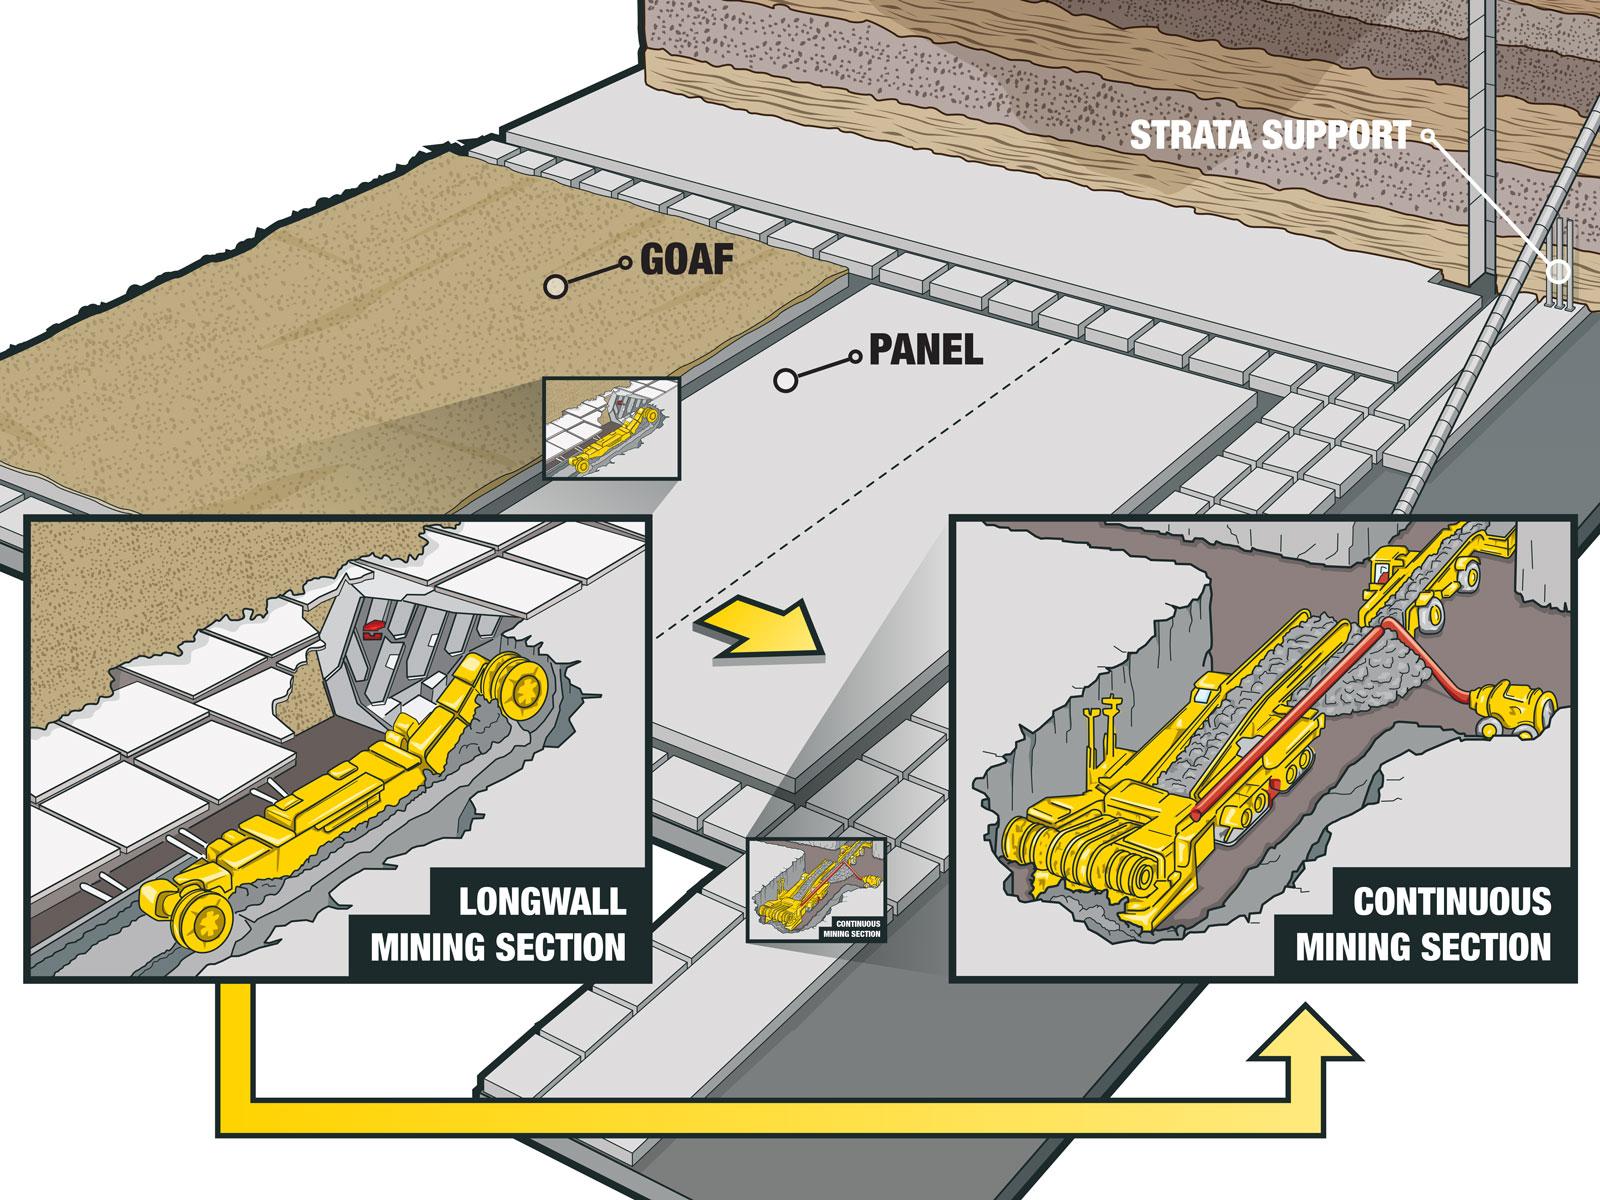 Mining Underground Cross-Section Illustration